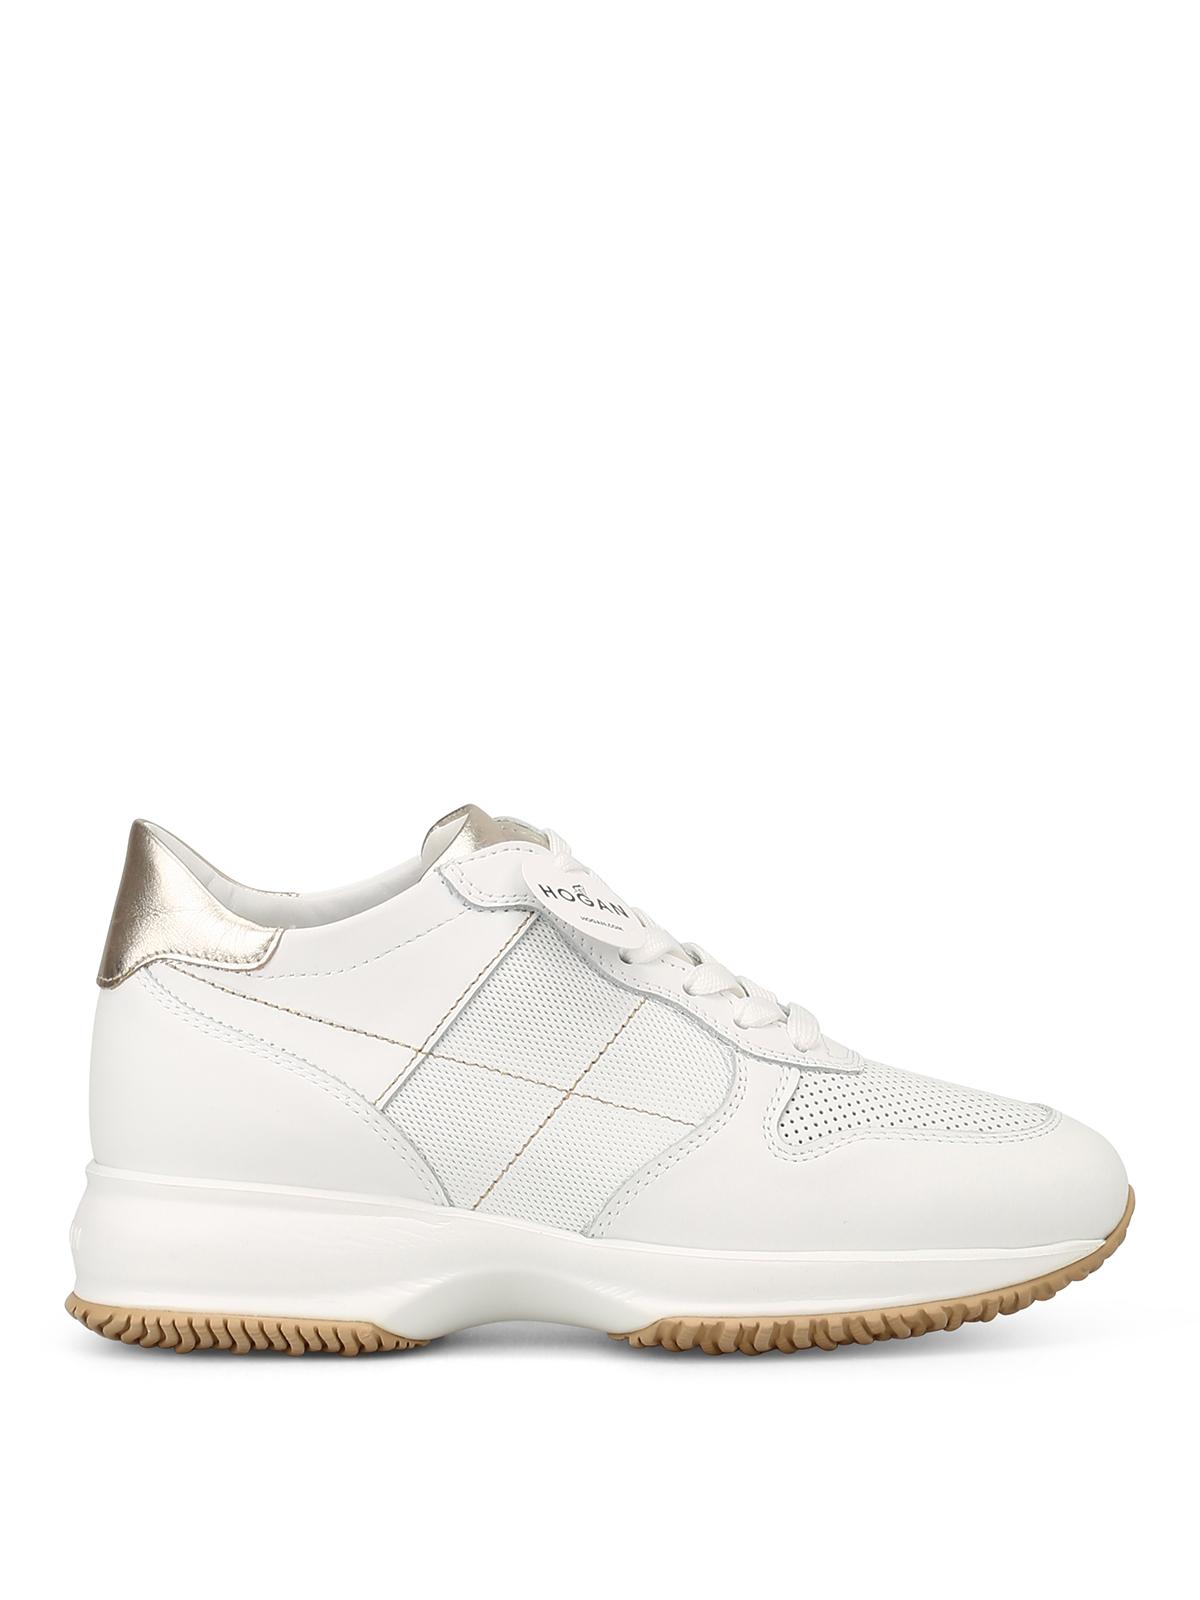 Sneakers Hogan - Interactive in pelle bianca - HXW00N0K620I6W1556